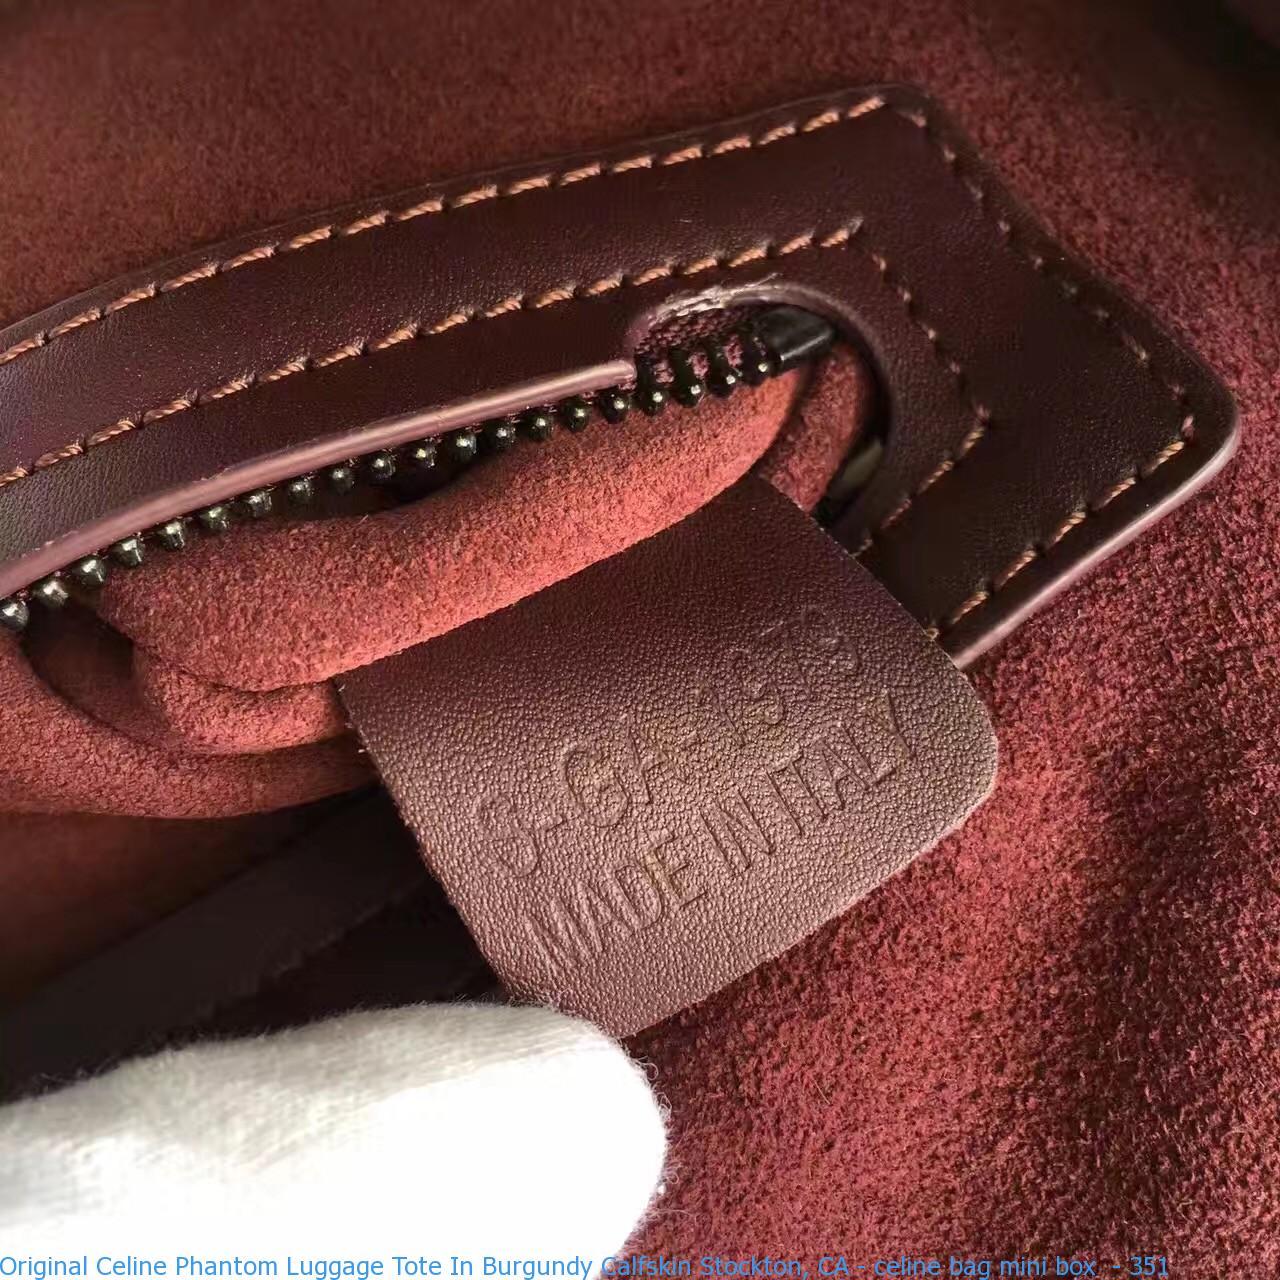 Original Celine Phantom Luggage Tote In Burgundy Calfskin Stockton ... 03799de0f668c